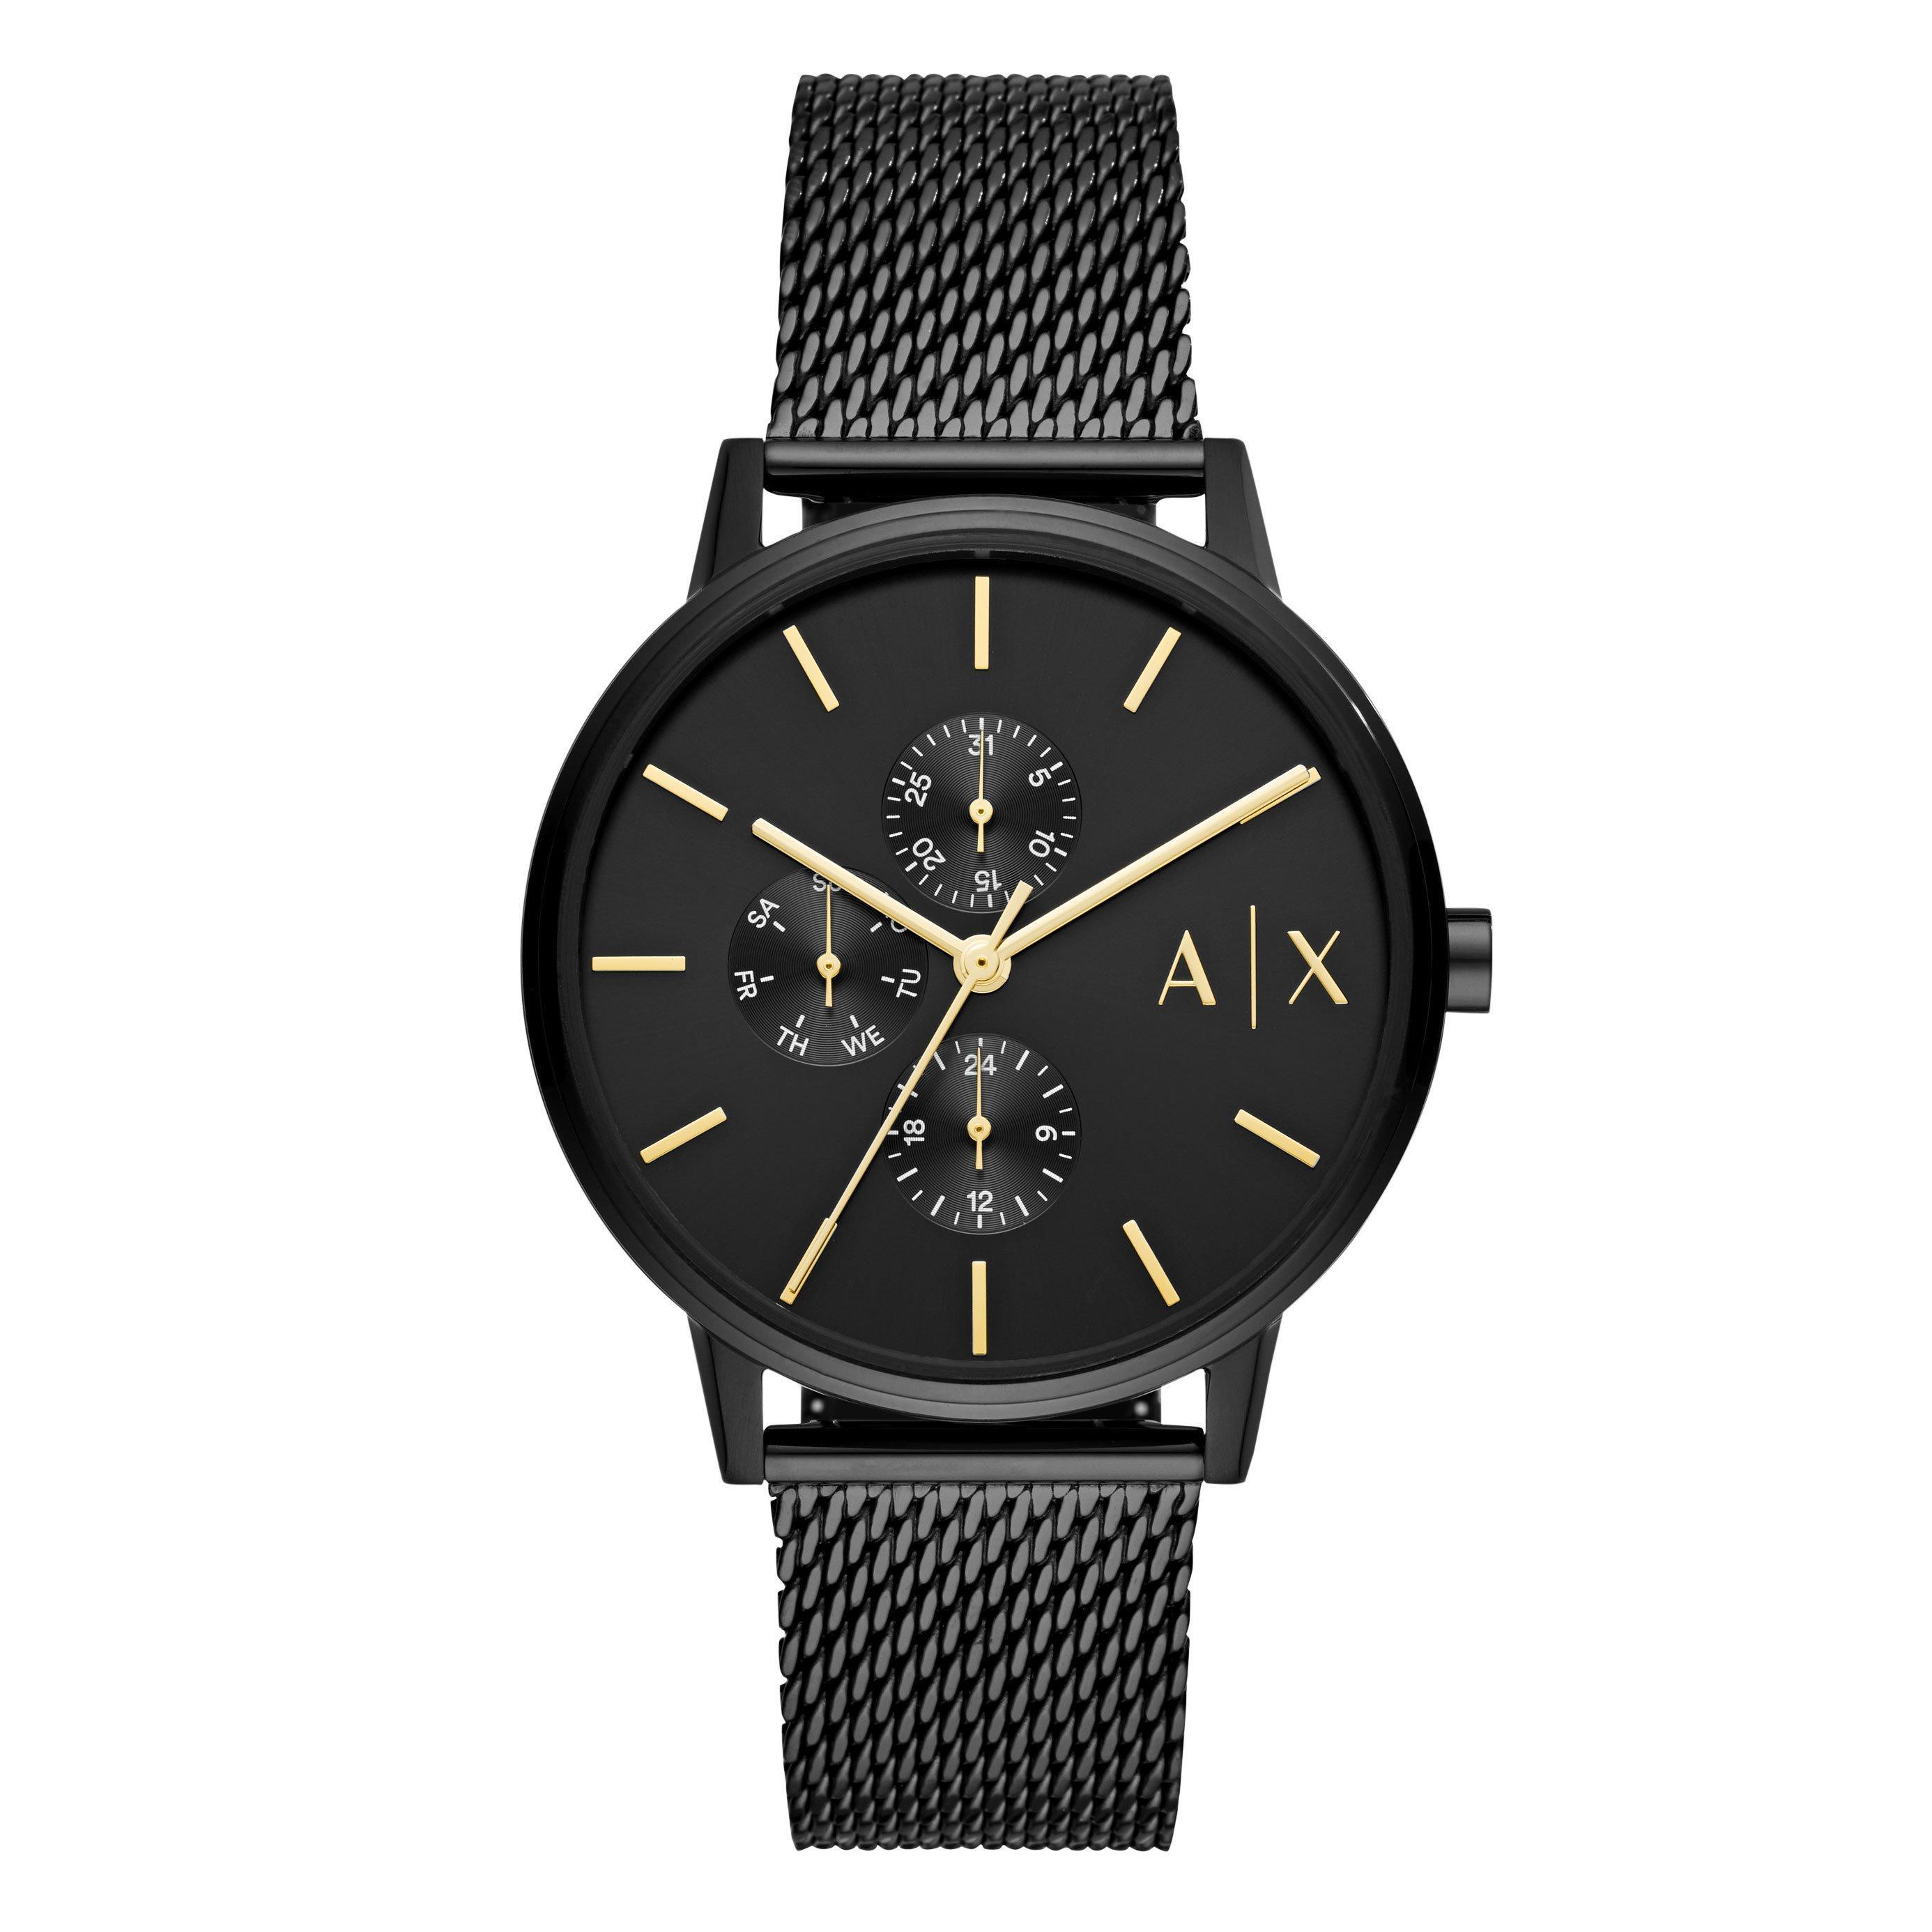 Armani Exchange Black Men's Watch